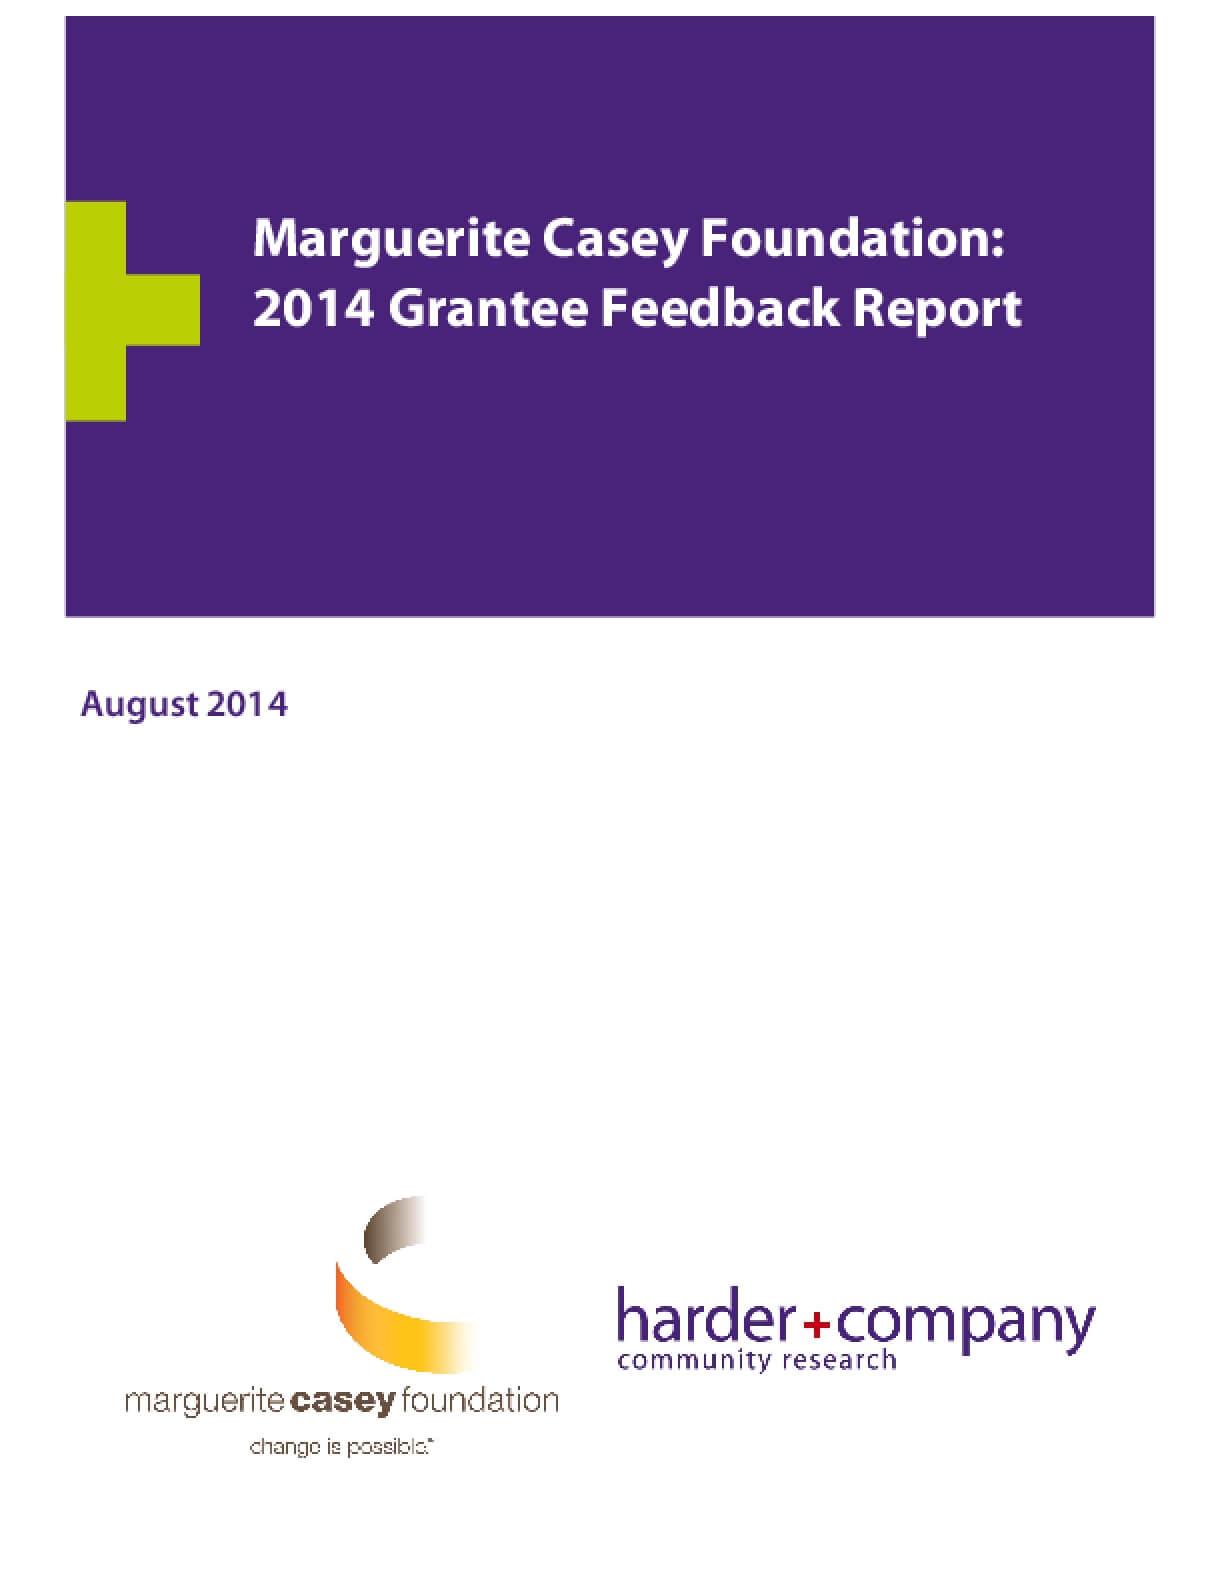 Marguerite Casey Foundation: 2014 Grantee Feedback Report